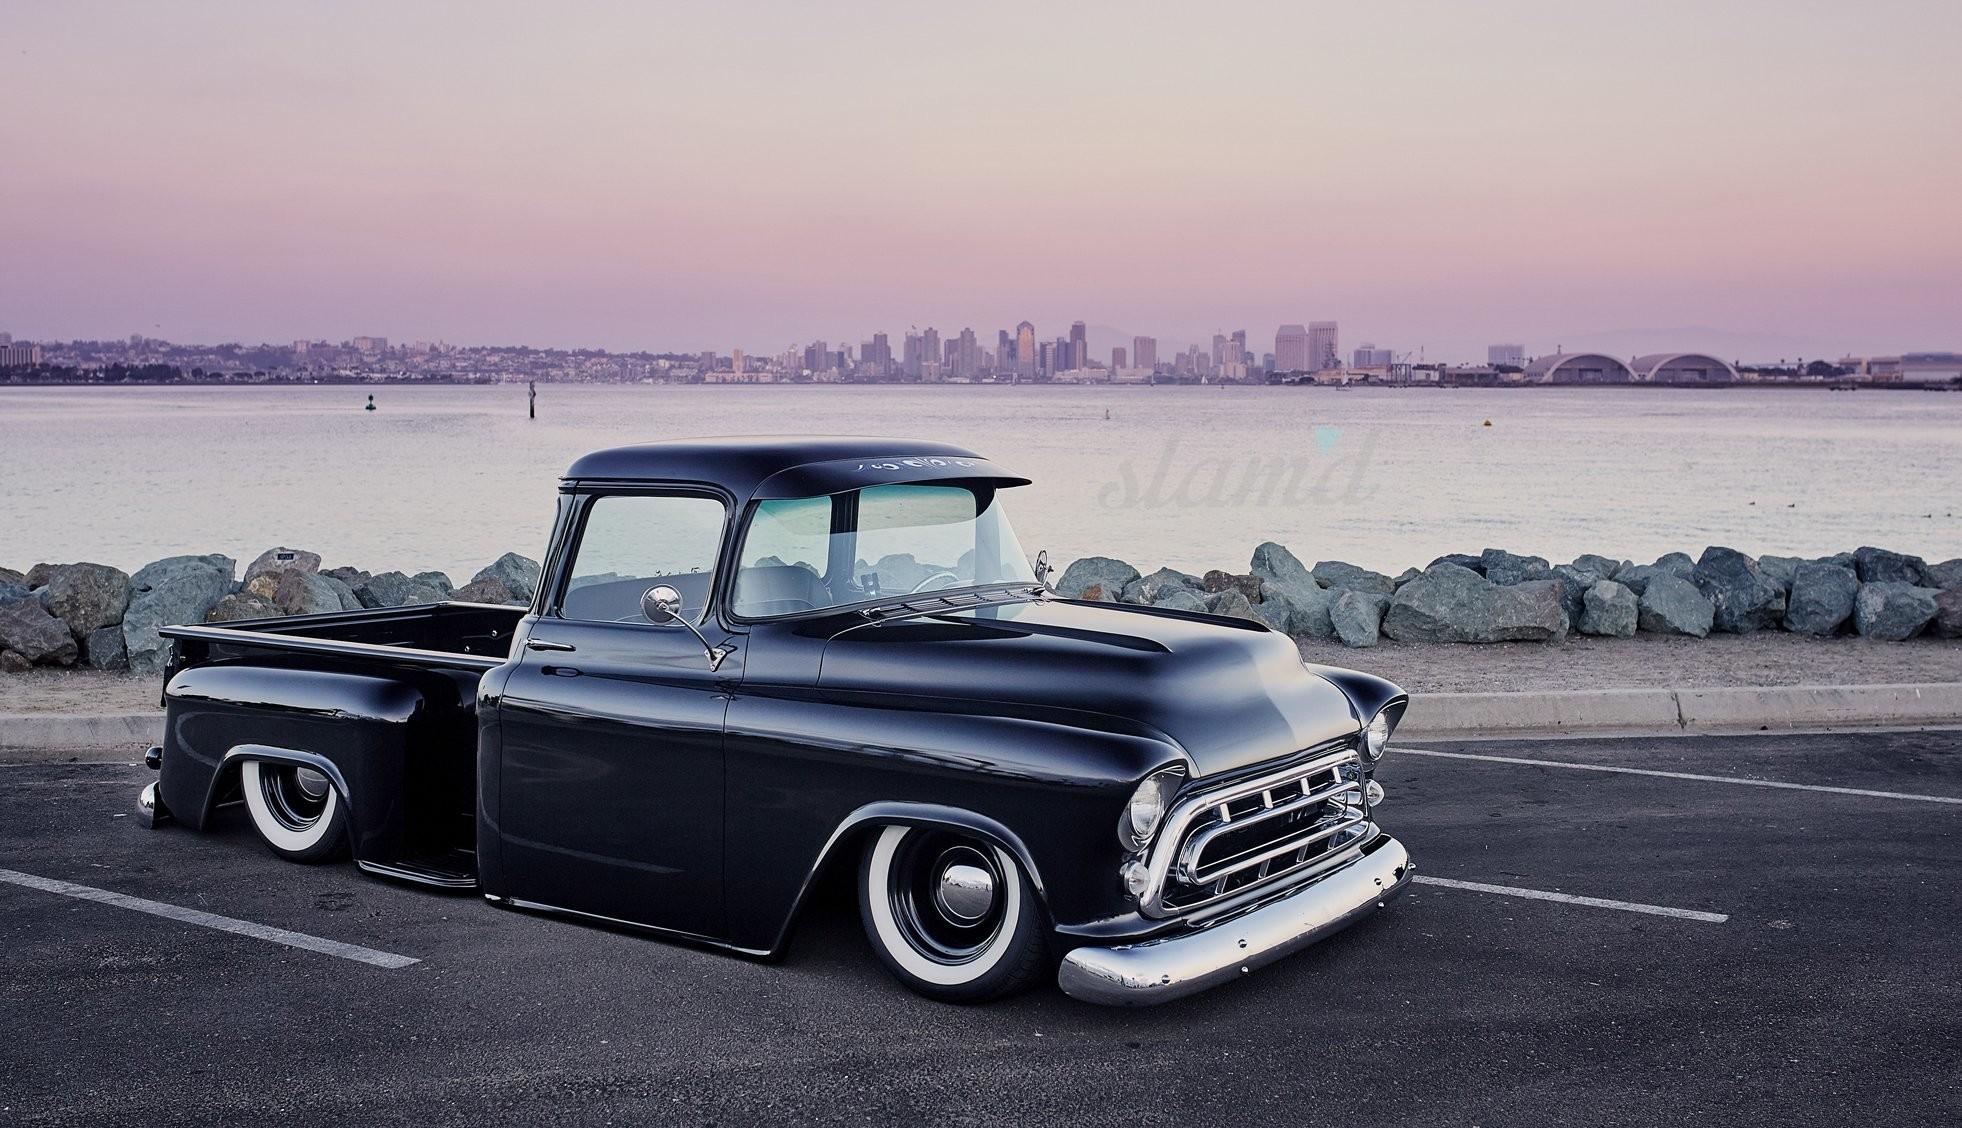 1957 CHEVY 3100 PICKUP tuning custom hot rod rods pickup truck wallpaper      839611   WallpaperUP